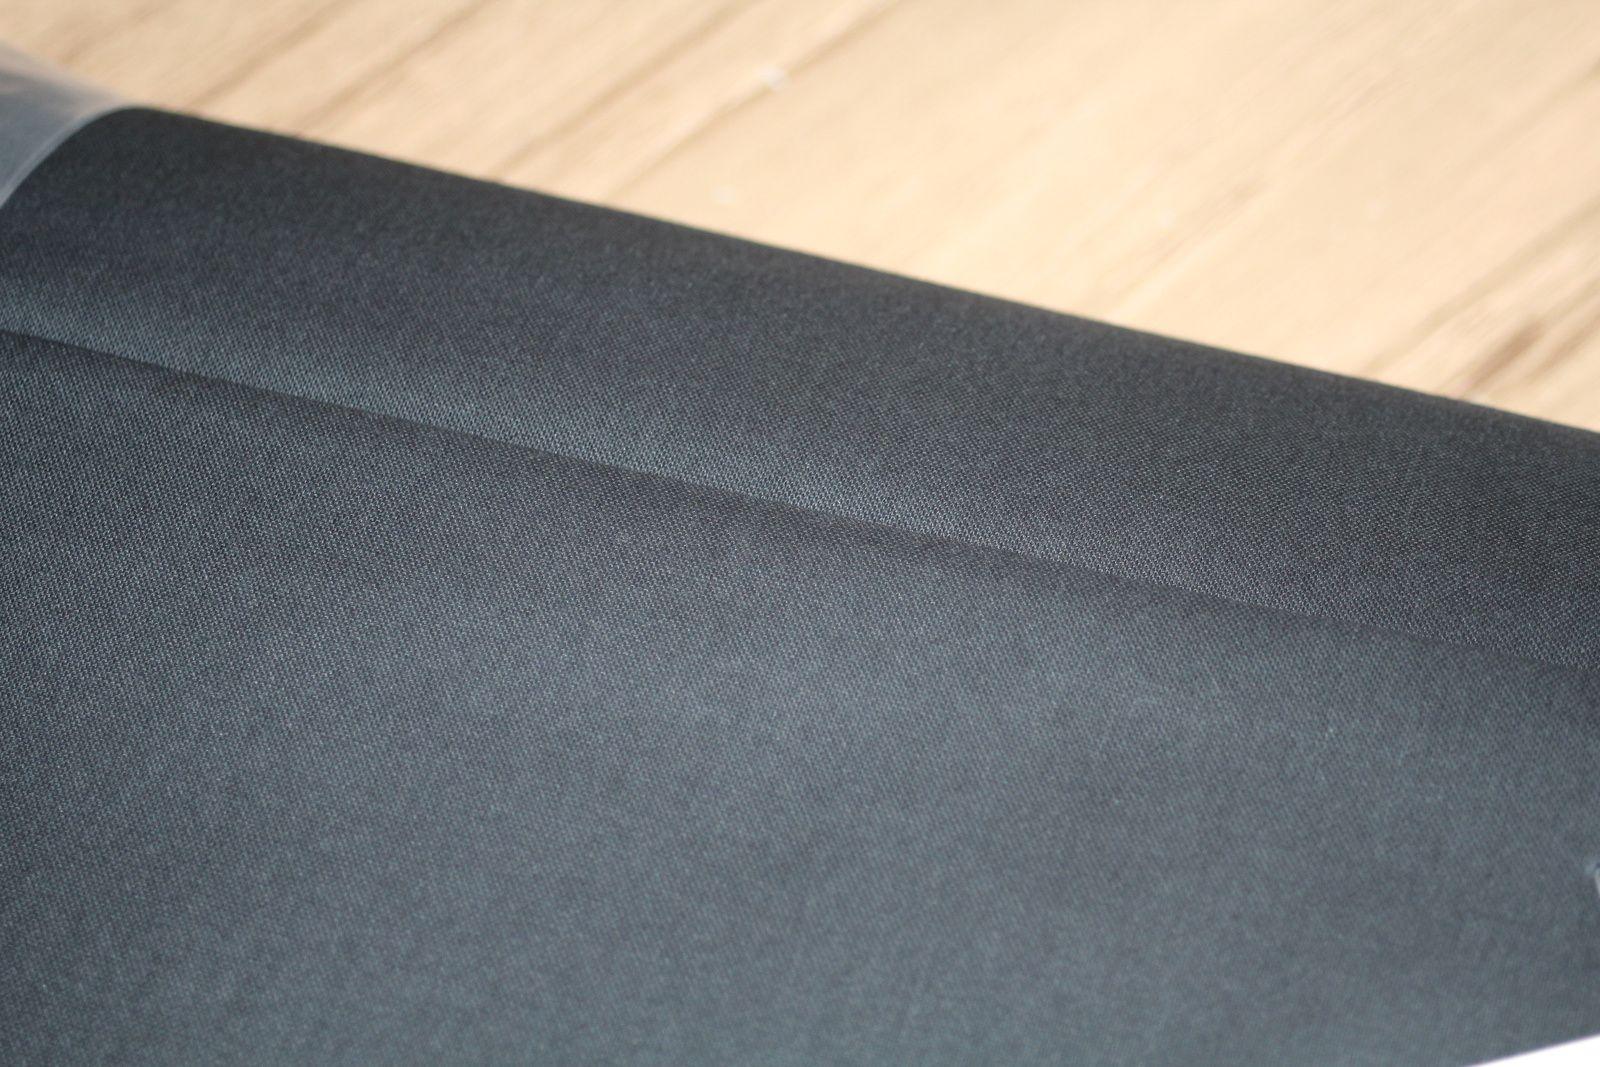 Le tissus Ikea avec son étiquette! Je ne mentais pas! / The Ikea fabric with this label! I wasn't lying!